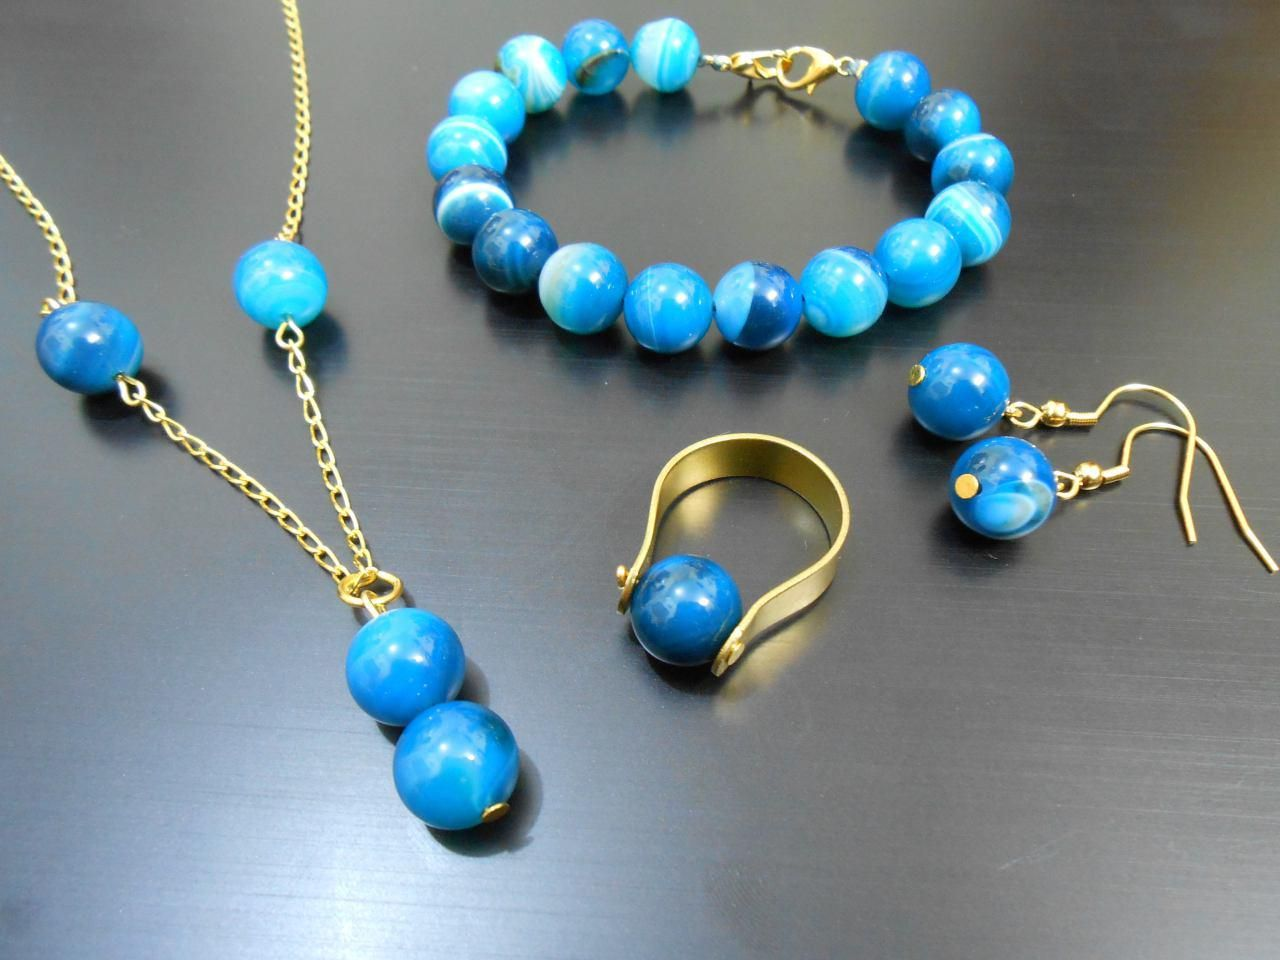 Pin by mahnaz Garmabi on wire jewelry Handicrafts   Pinterest ...